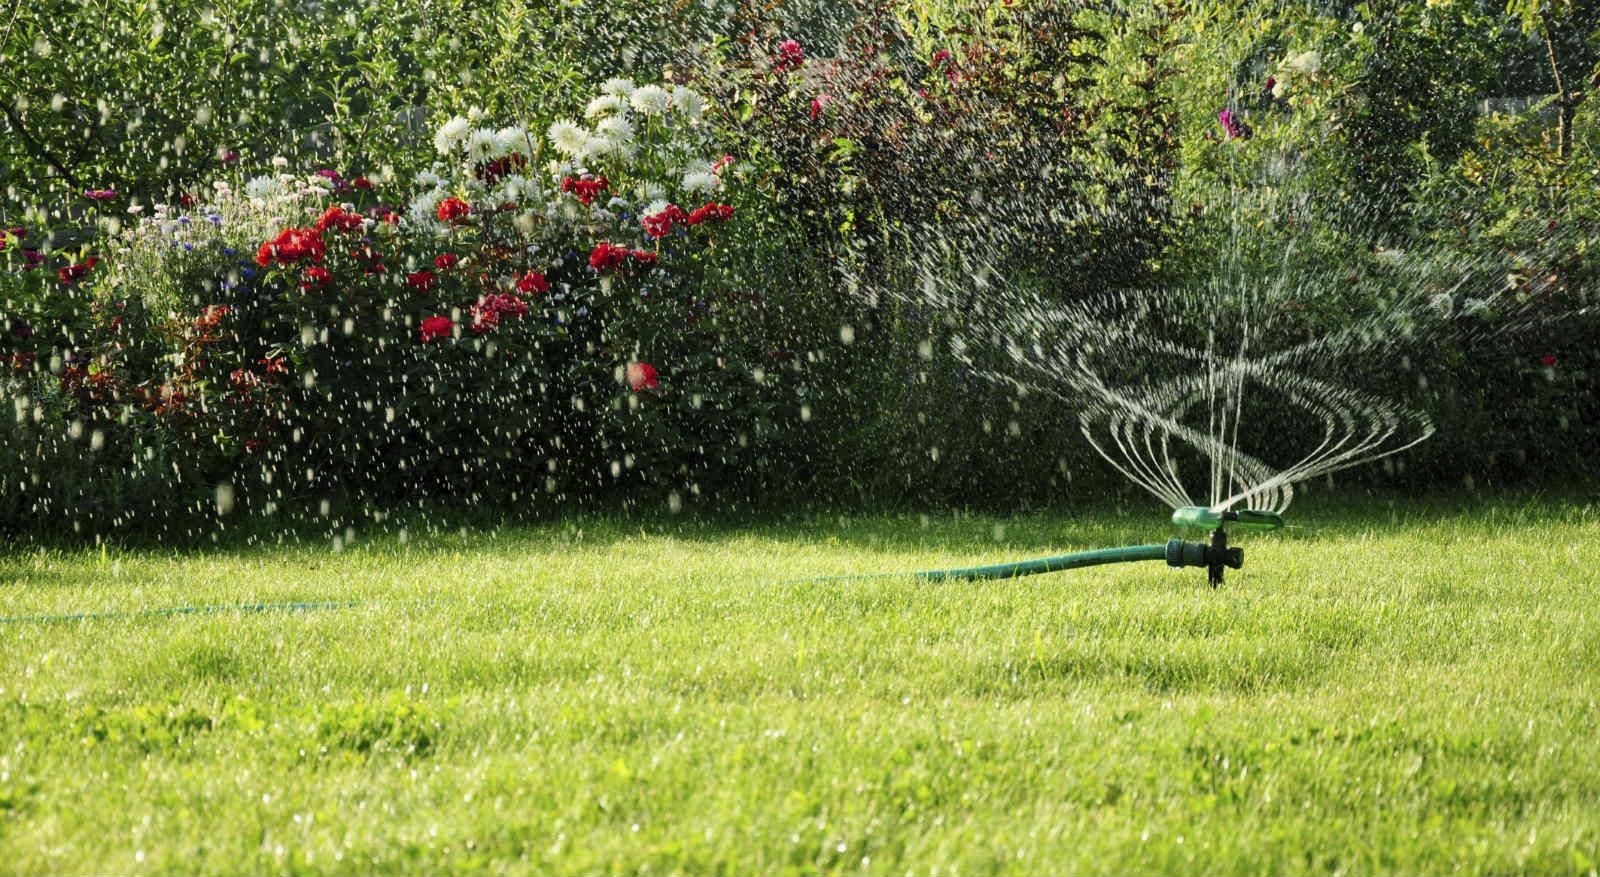 matts-lawn-service